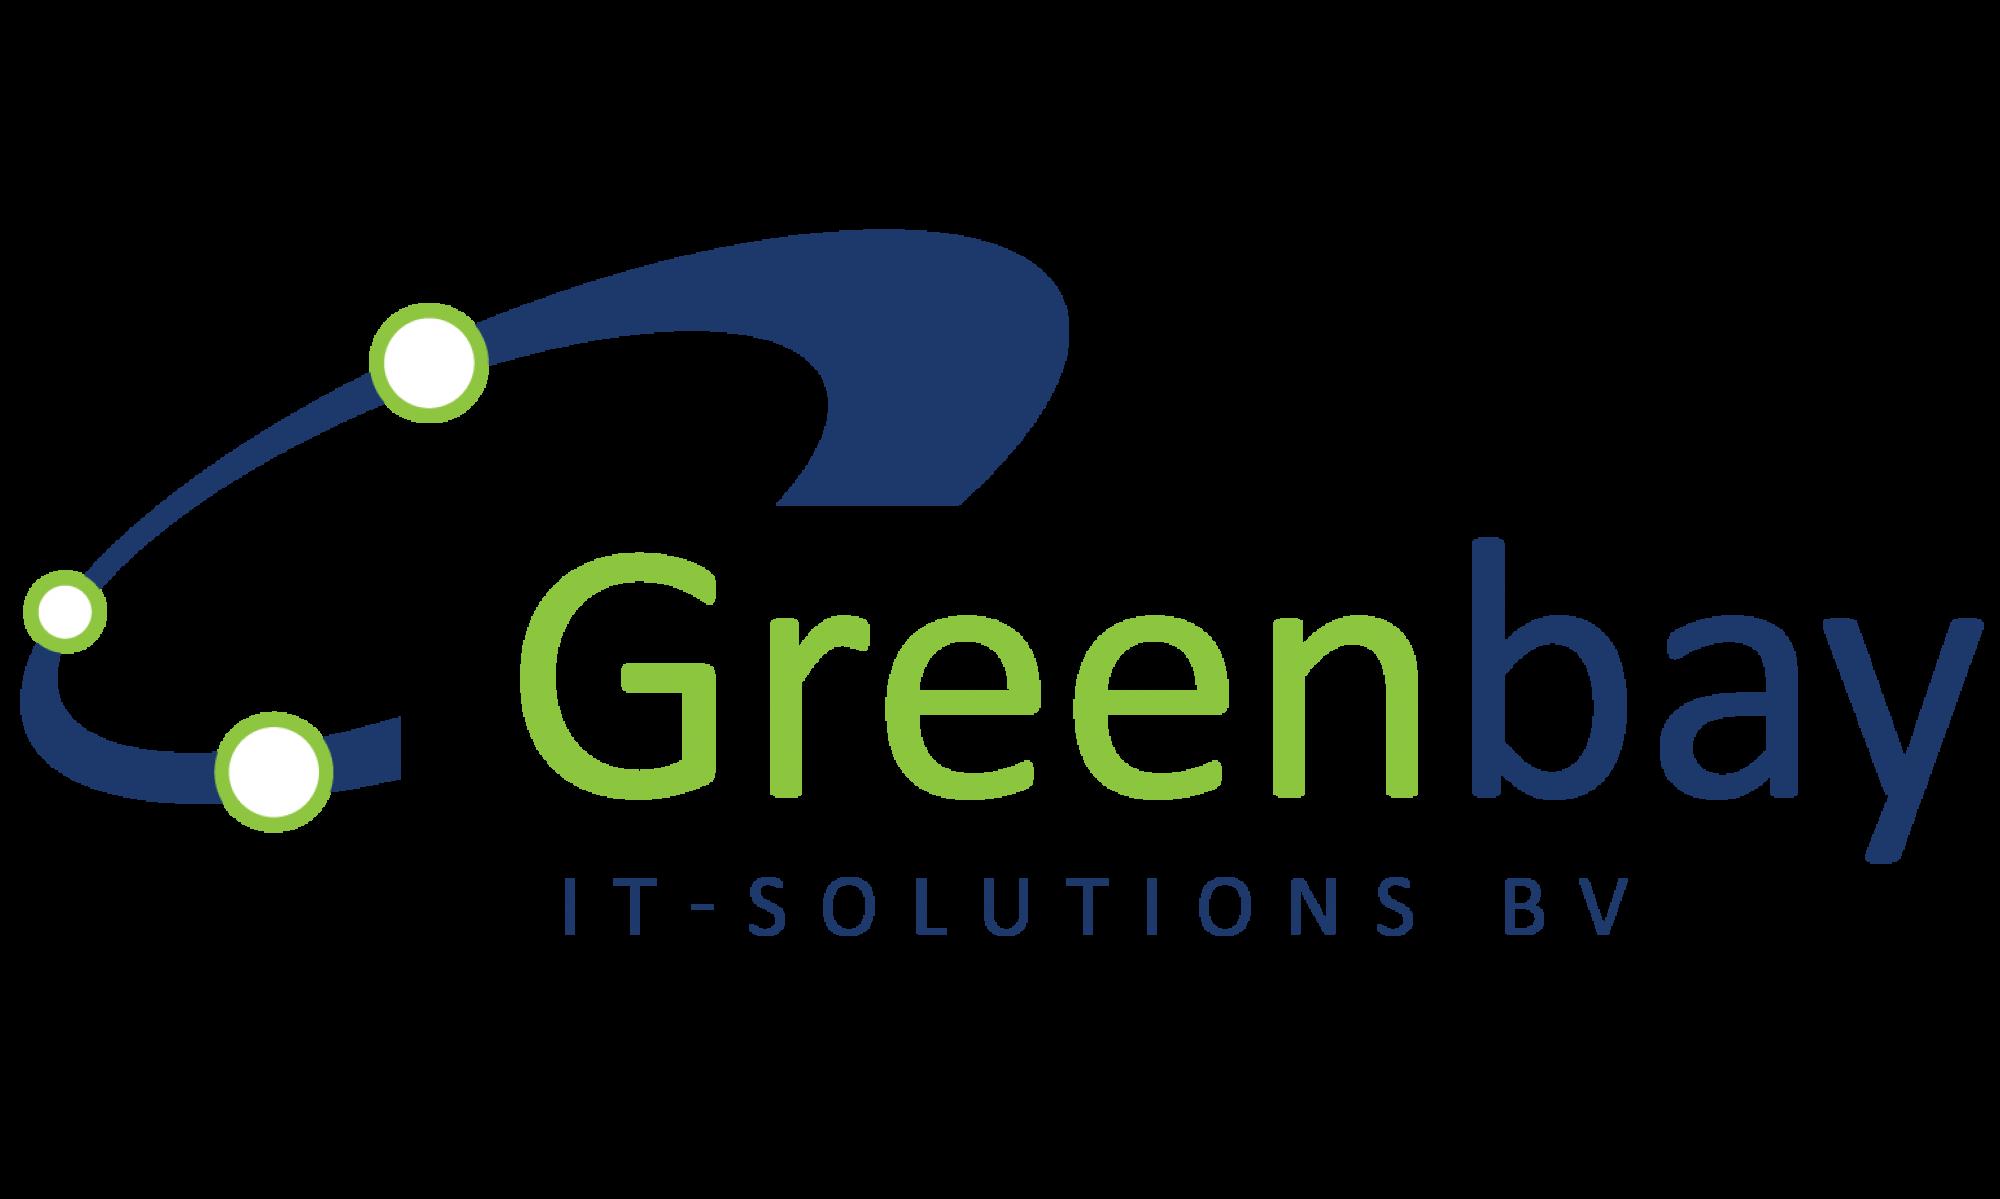 Greenbay ITSolutions B.V.